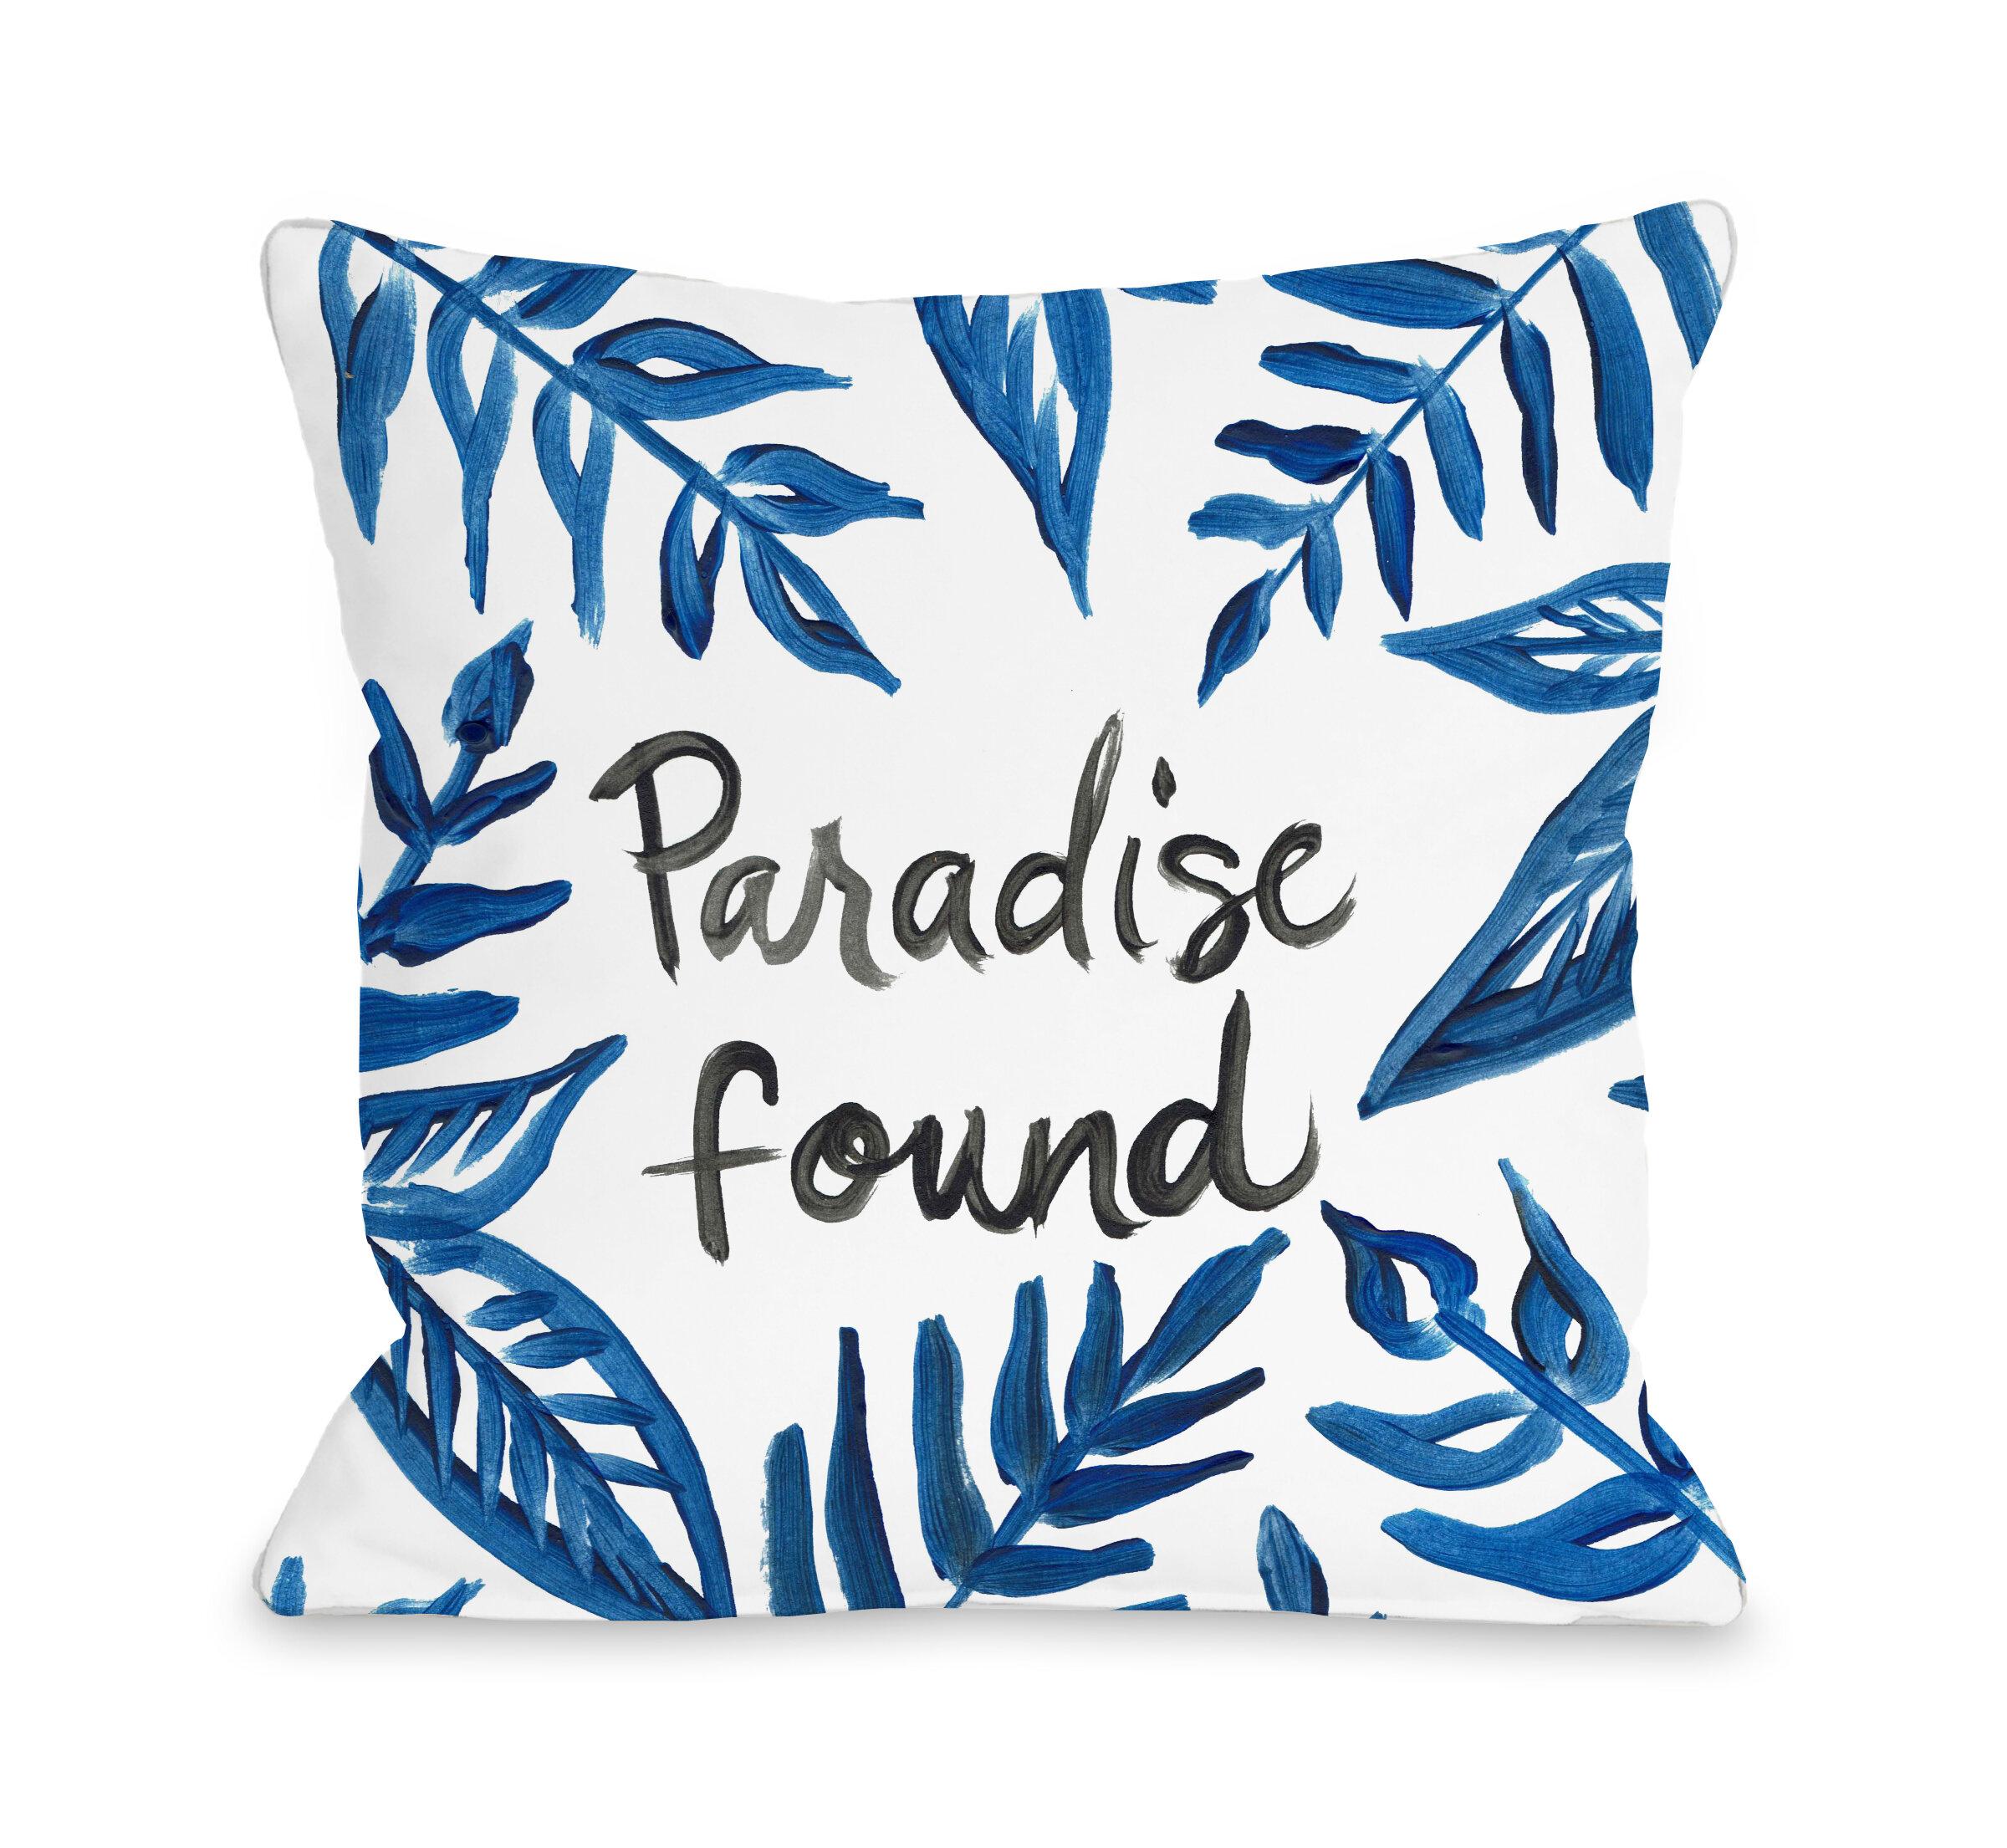 Bay Isle Home Eldridge Paradise Found Outdoor Throw Pillow Reviews Wayfair